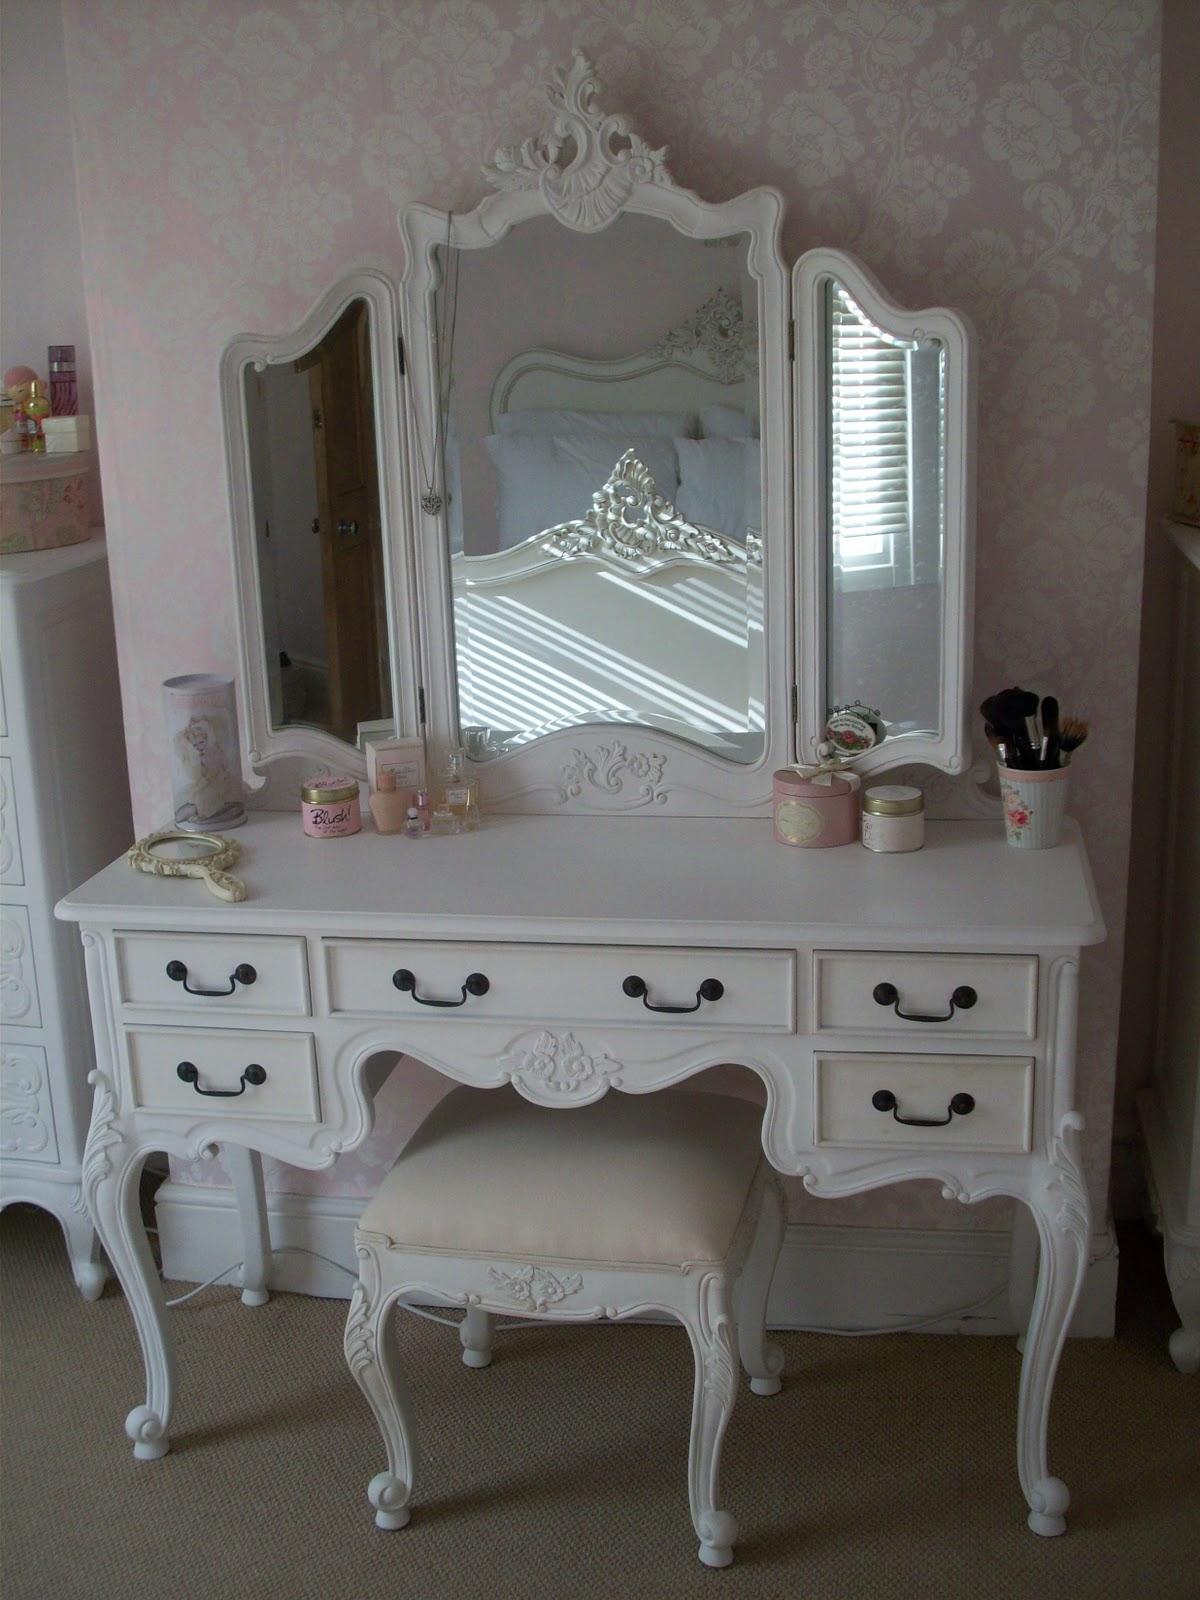 Black Antique Wood Makeup Vanity Table With Mirror And Bench Saubhaya Makeup